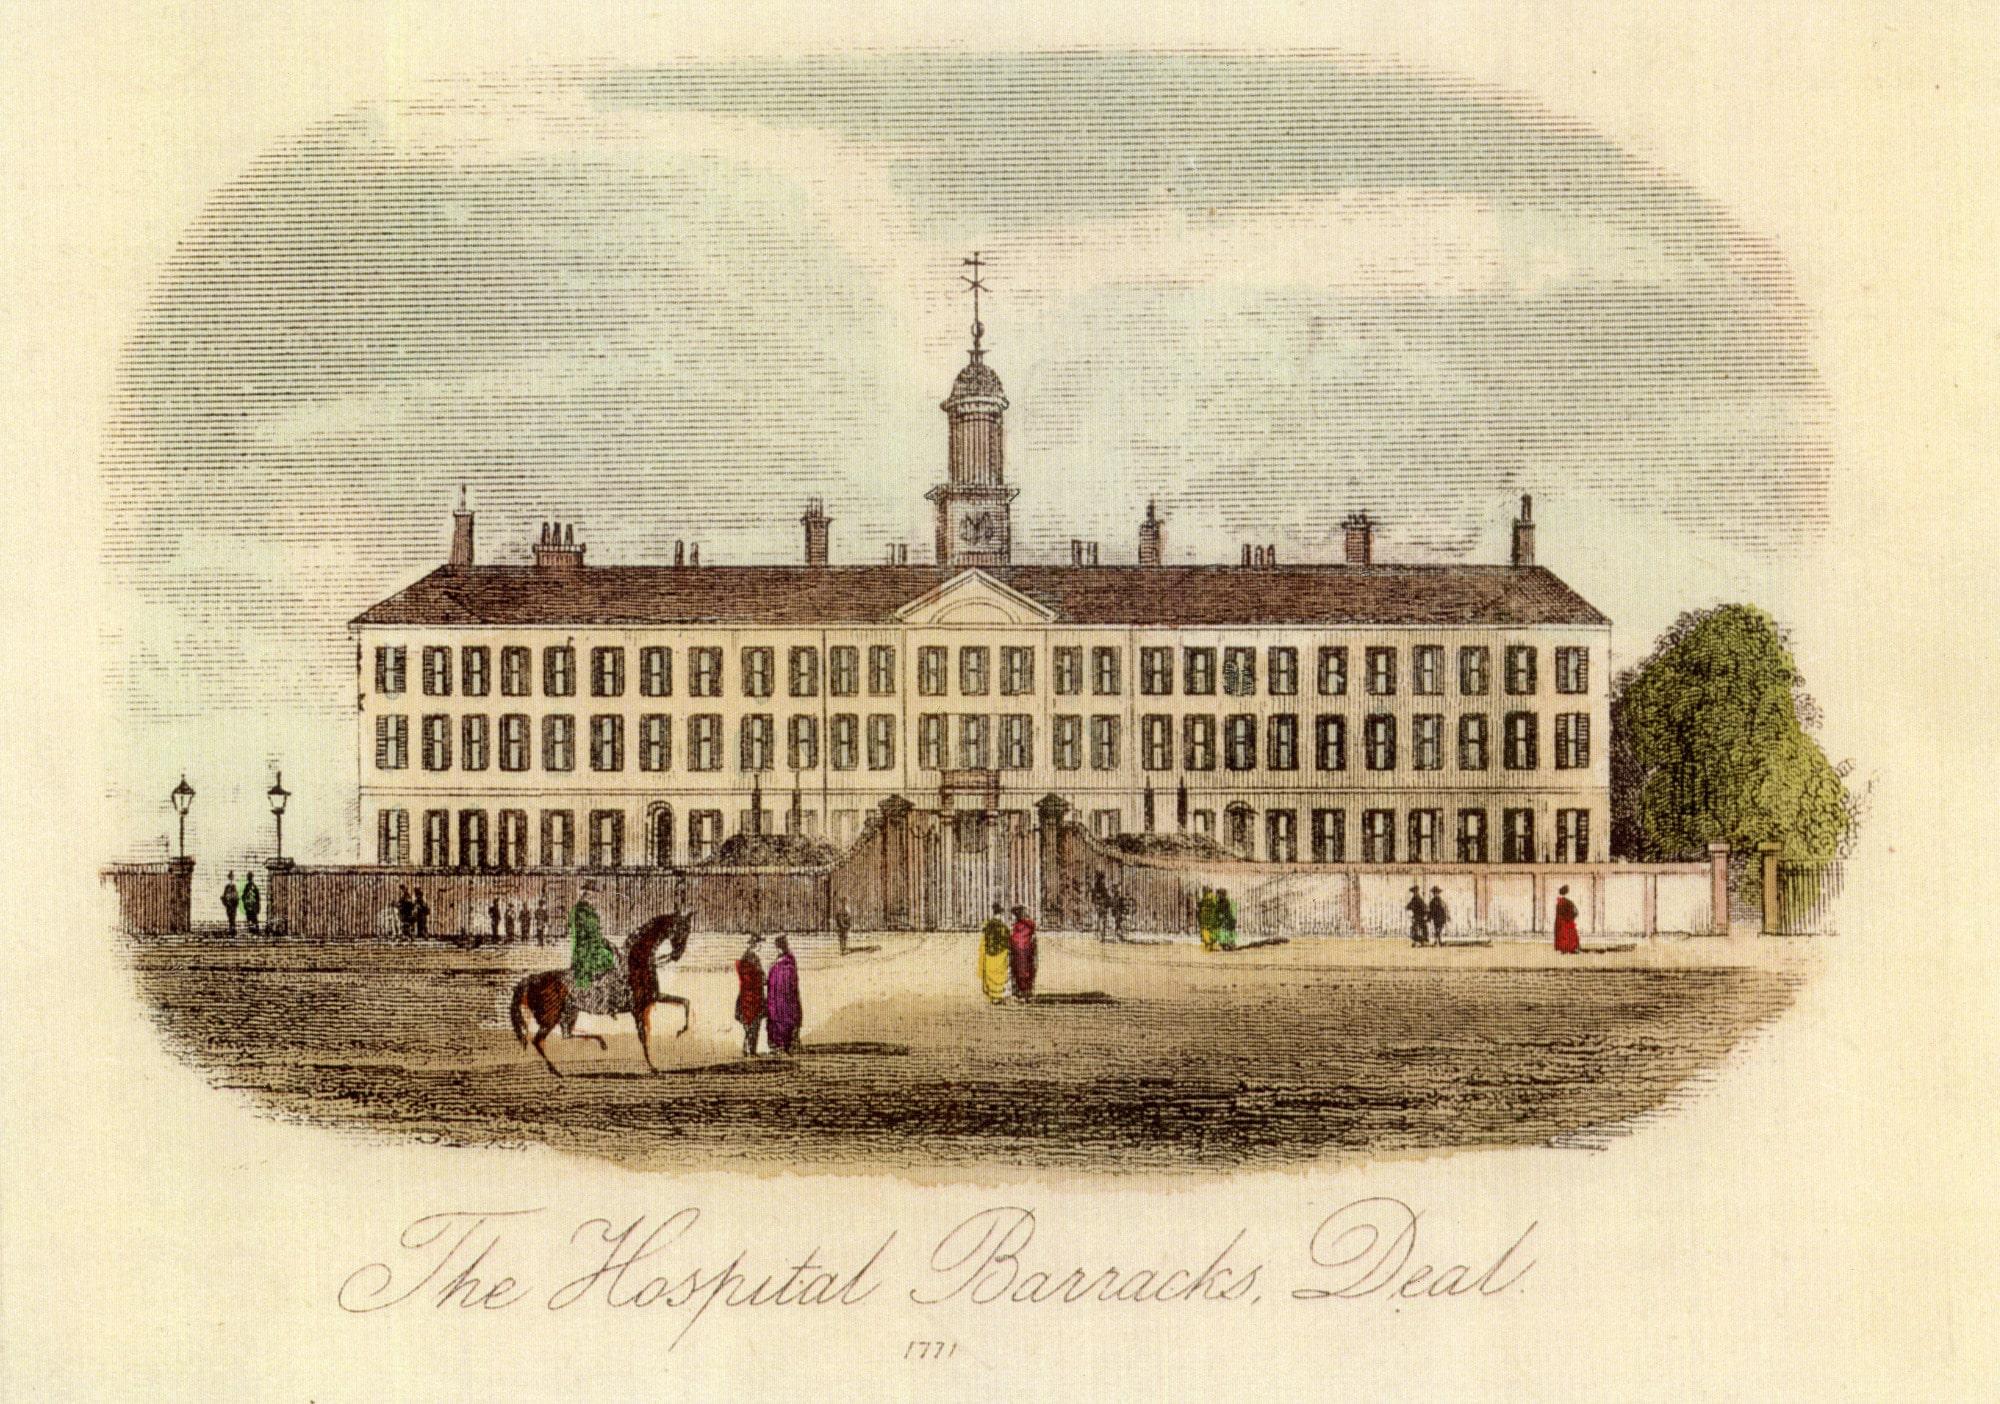 Hospital Barracks